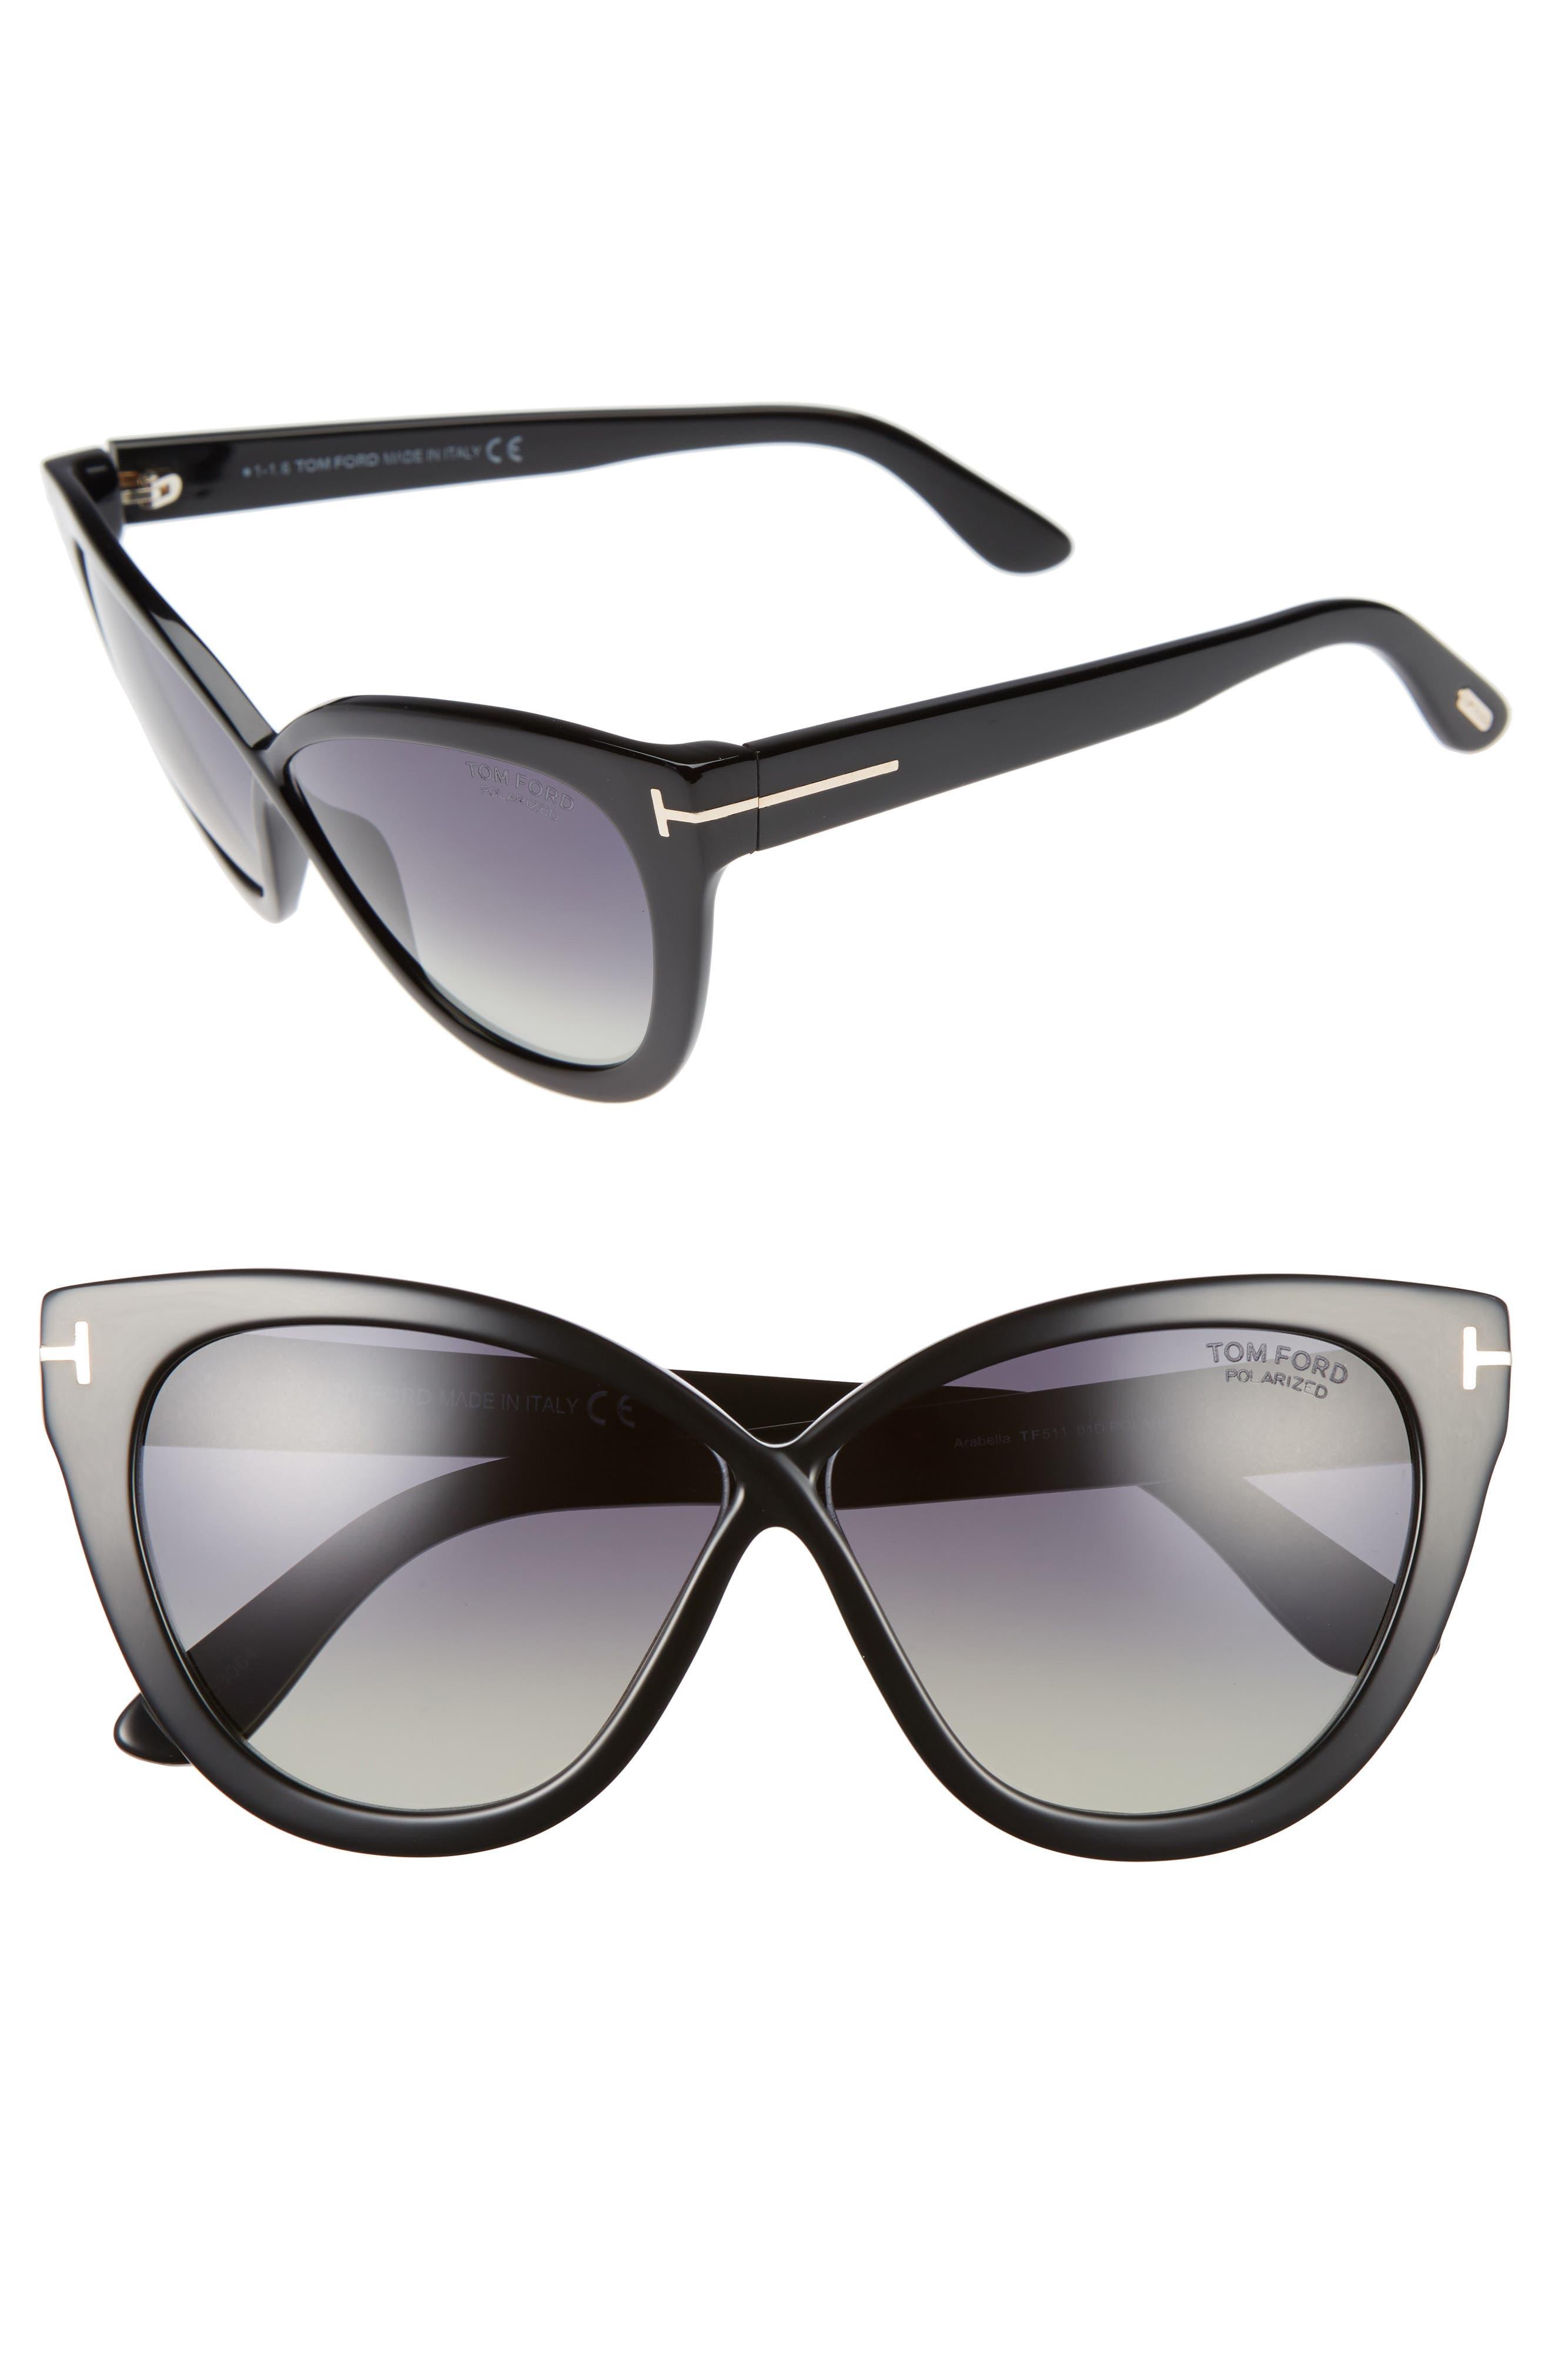 Arabella 59mm Cat Eye Sunglasses,                             Main thumbnail 1, color,                             001